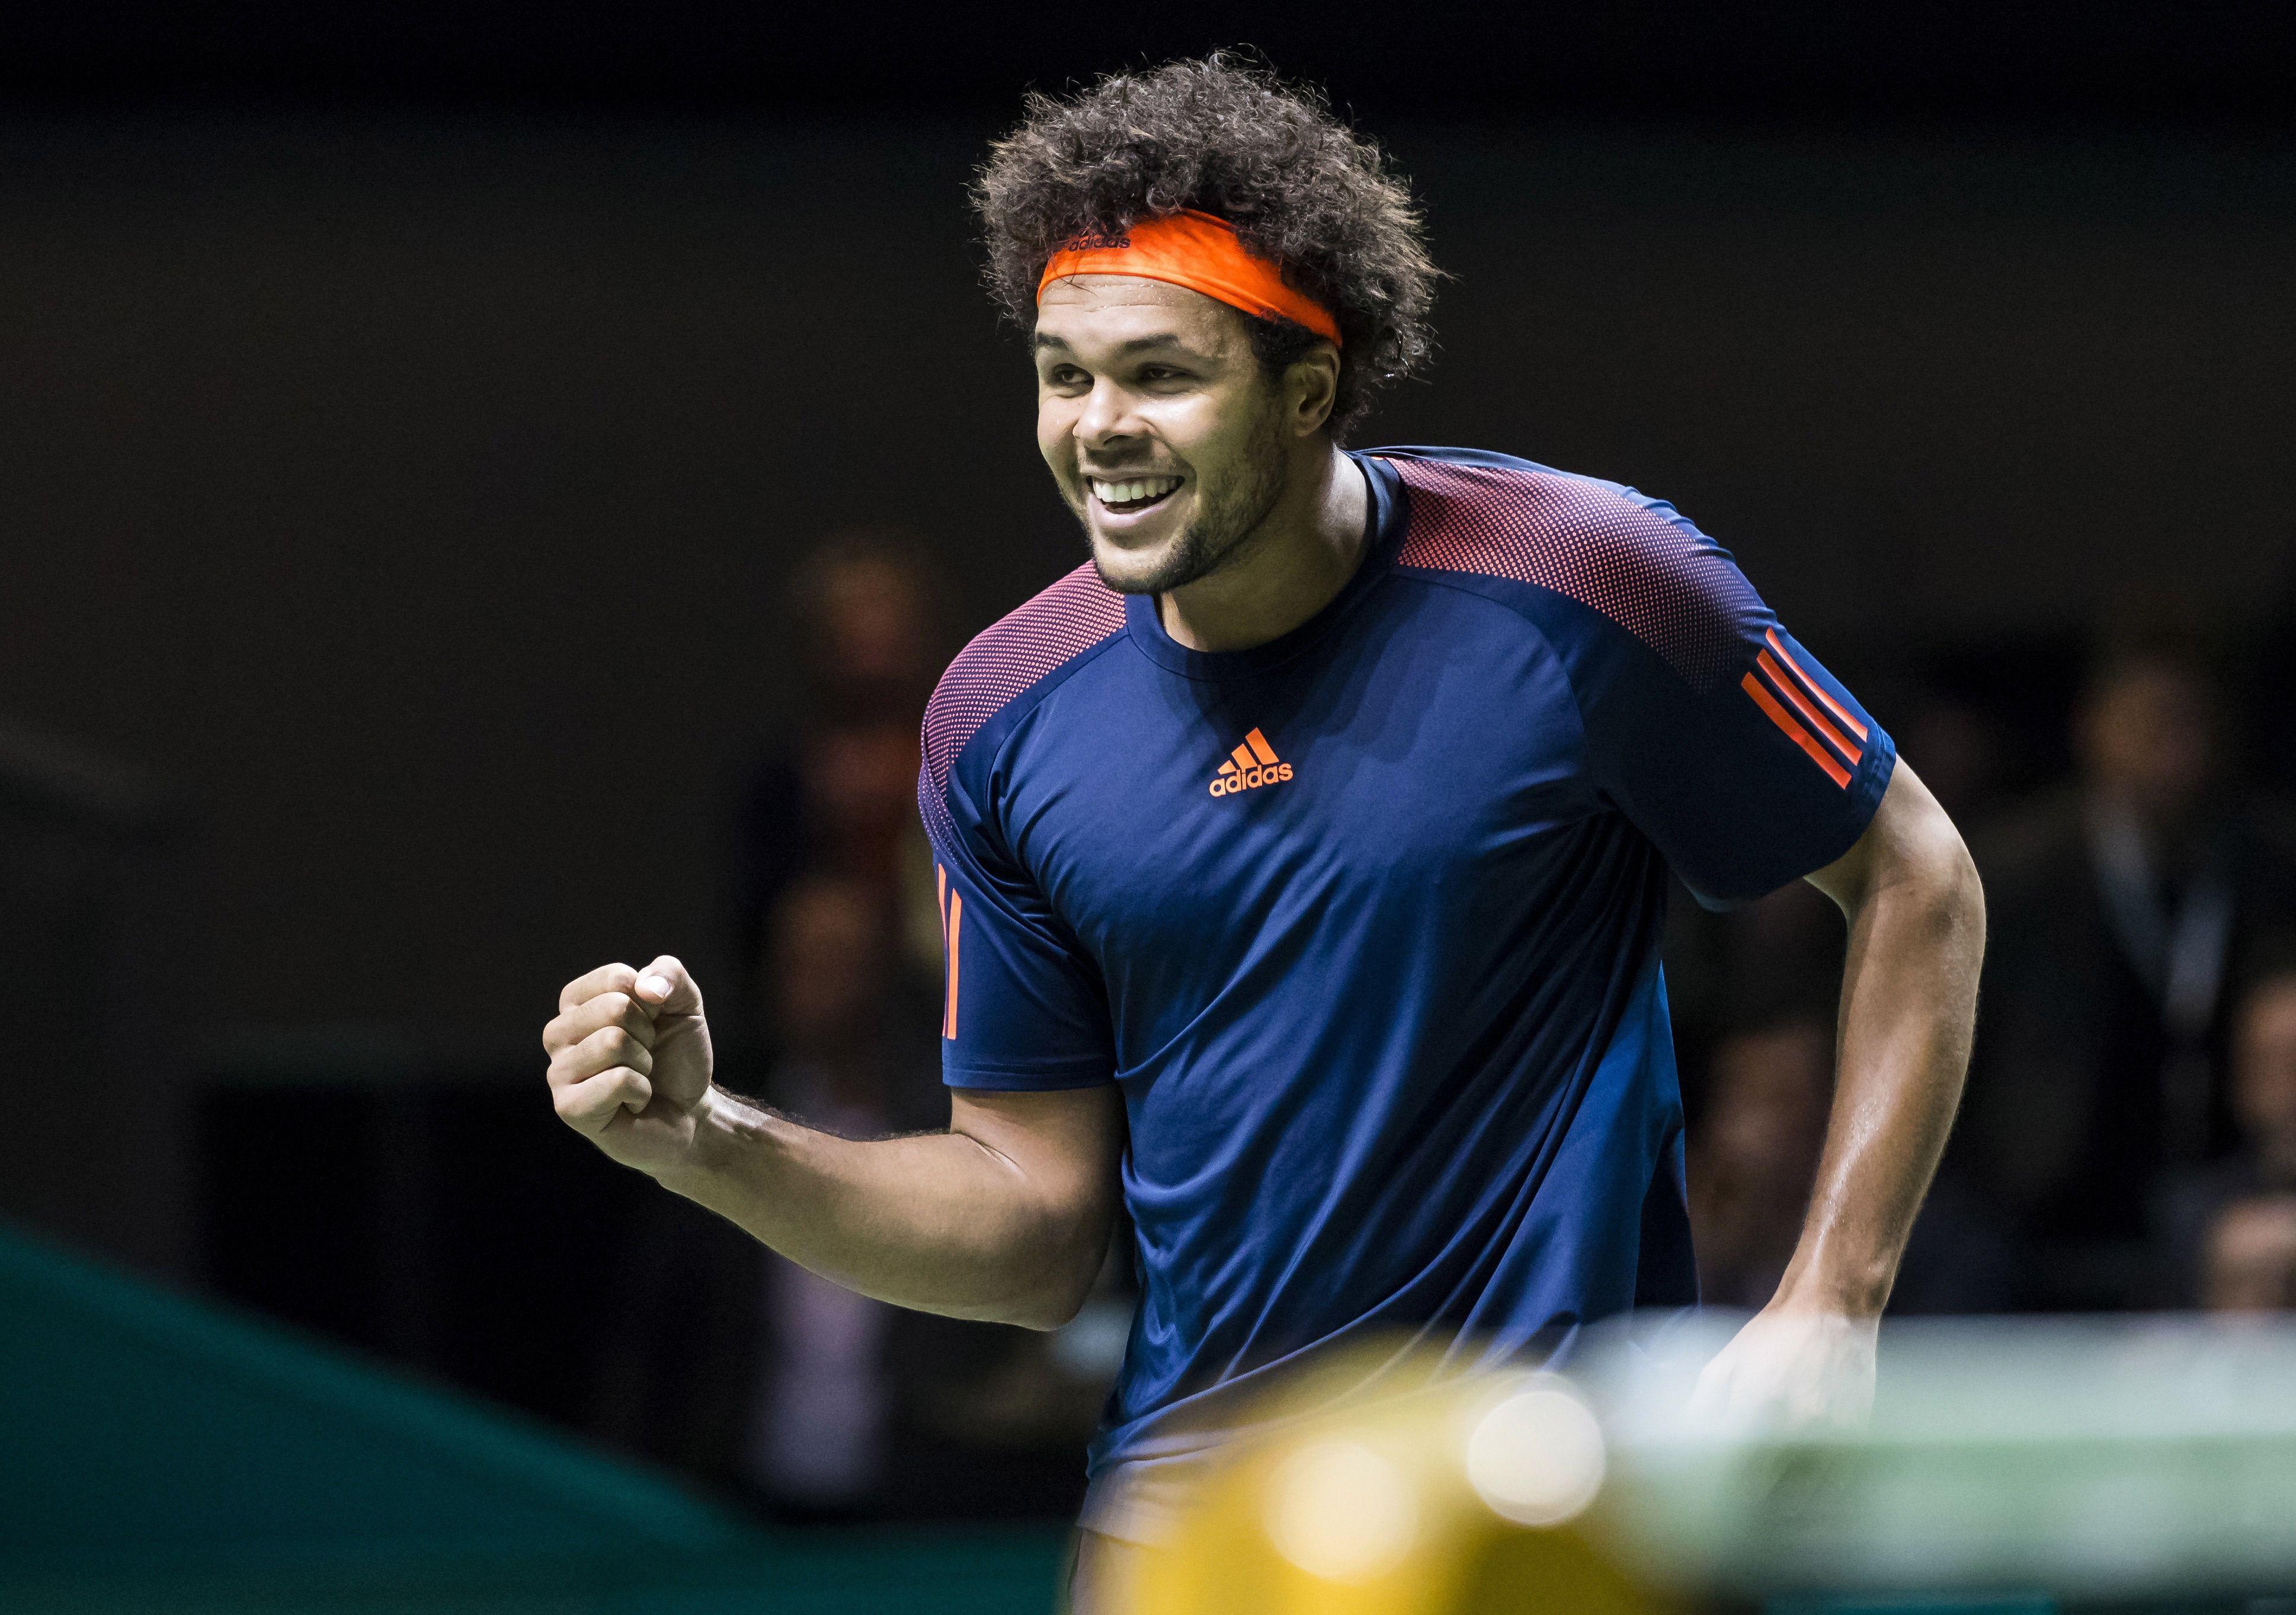 Jo-Wilfried Tsonga rallies to brush aside David Goffin at the Rotterdam Open final